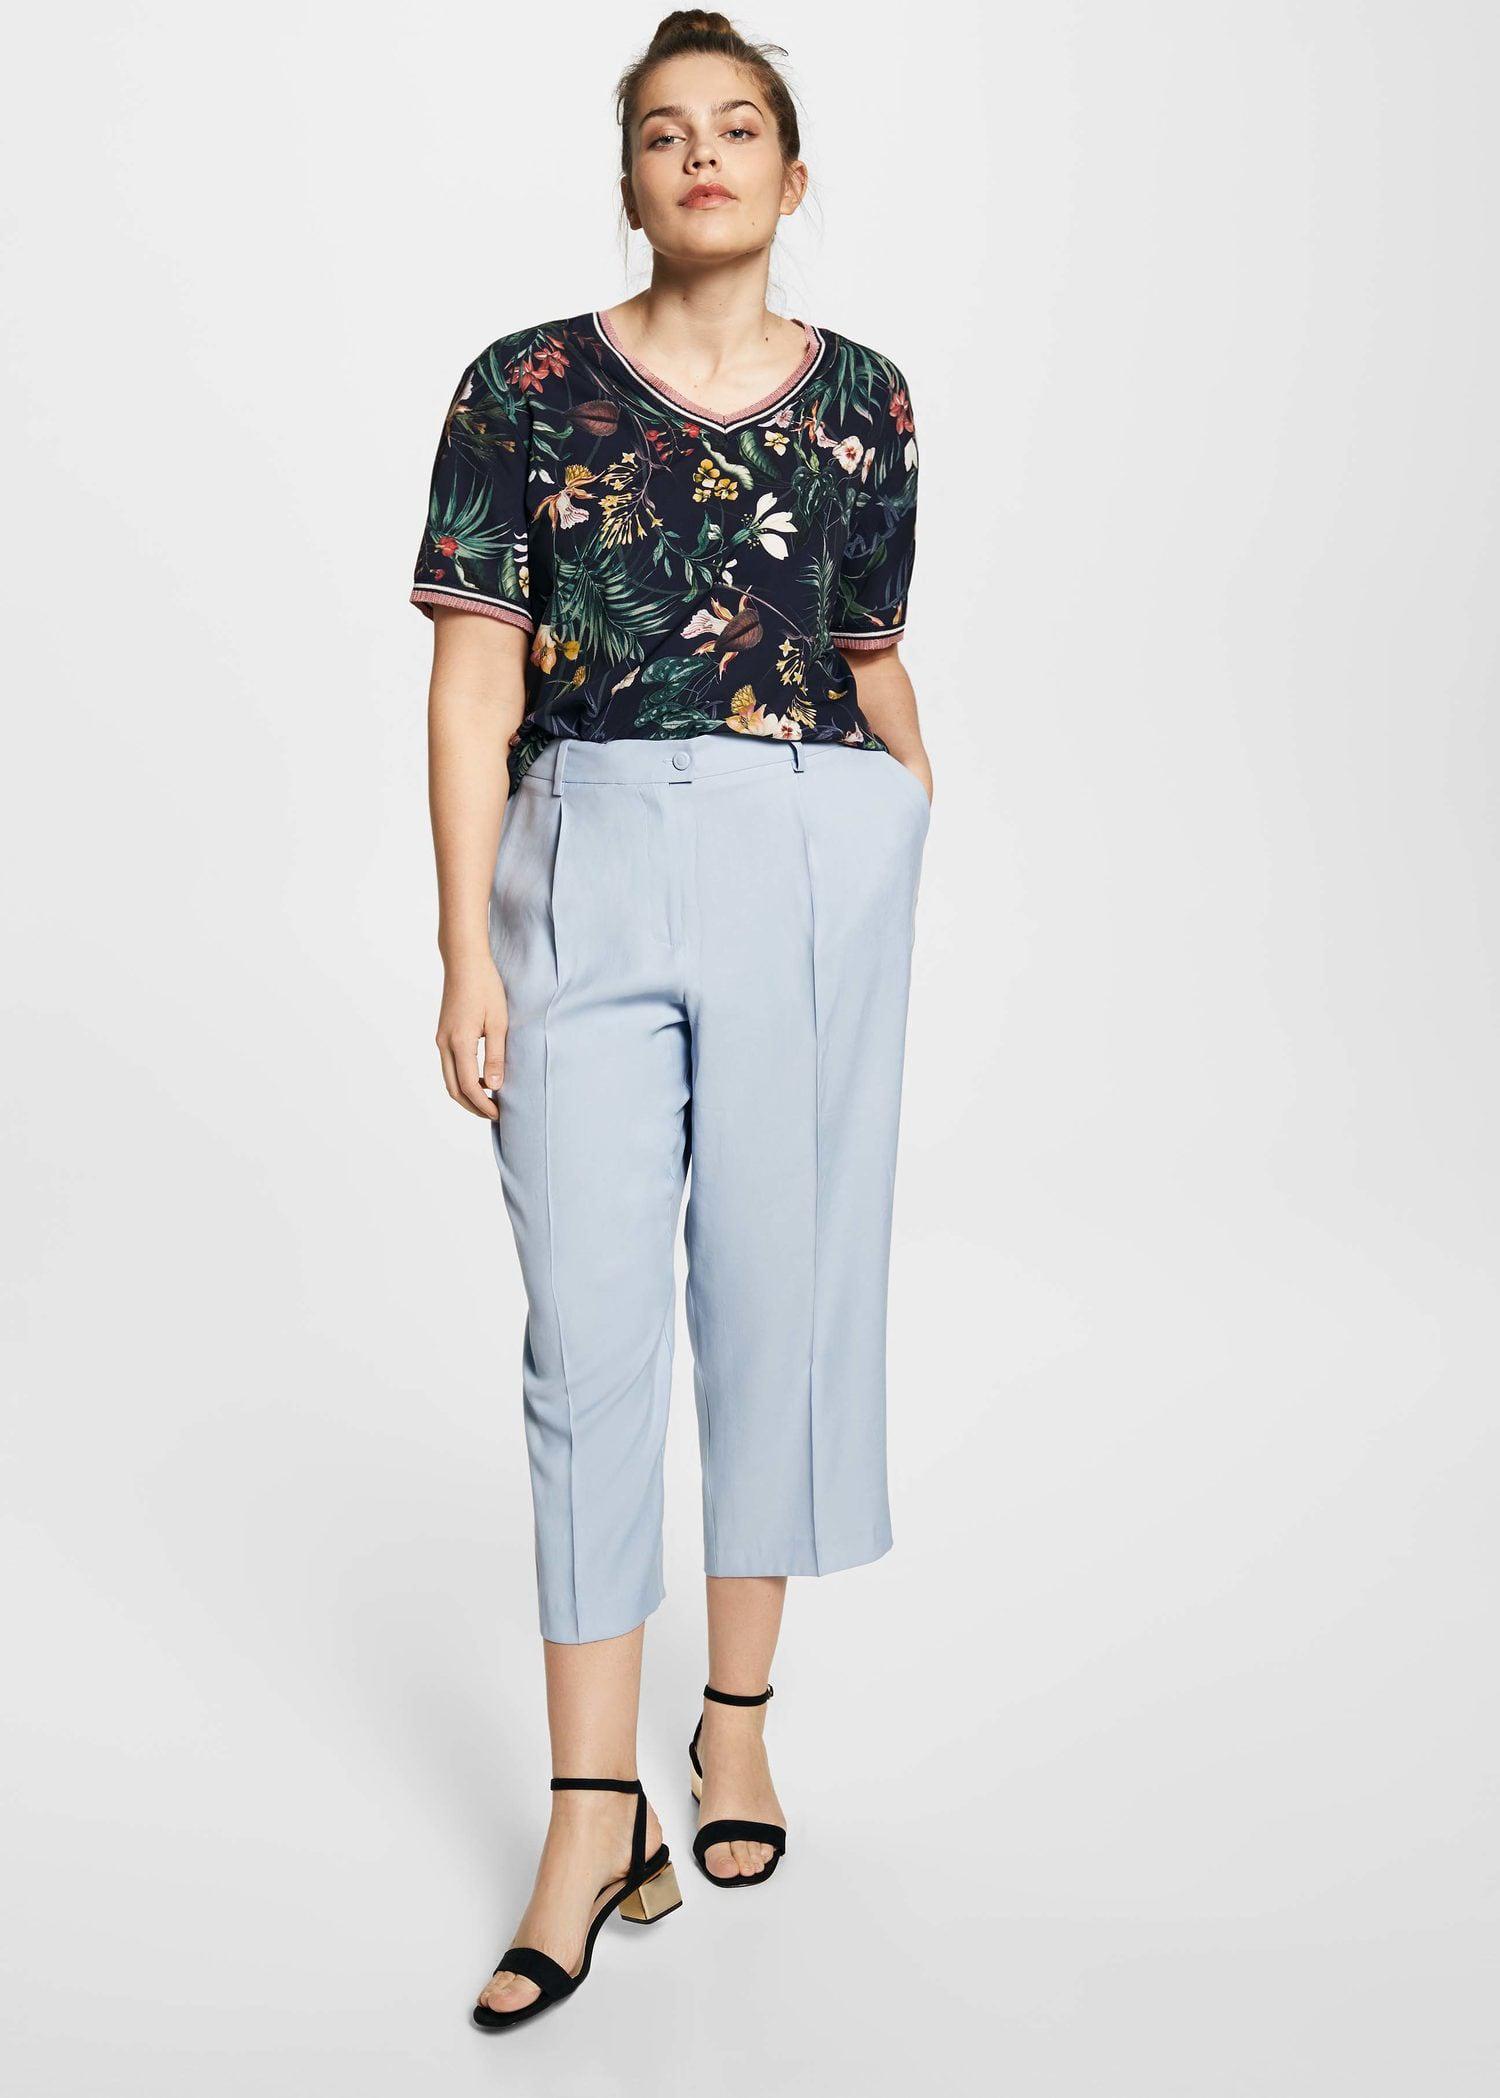 Violeta by Mango. Women's Blue Combined Printed T-shirt